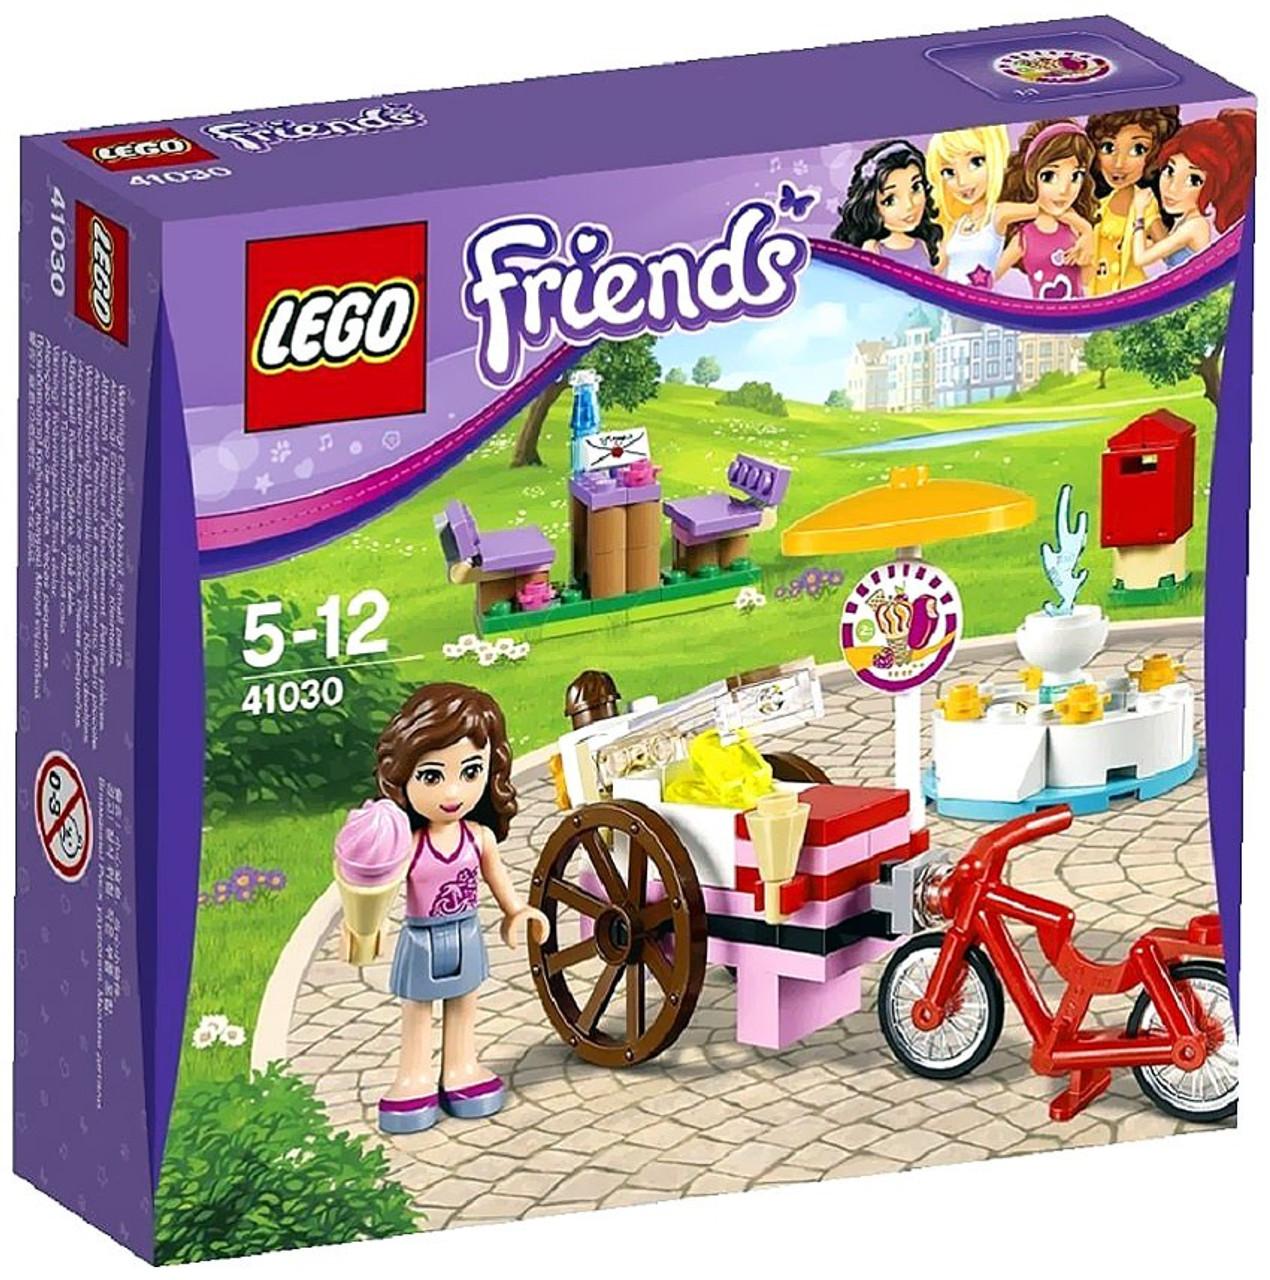 LEGO Friends Olivia's Ice Cream Bike Set #41030